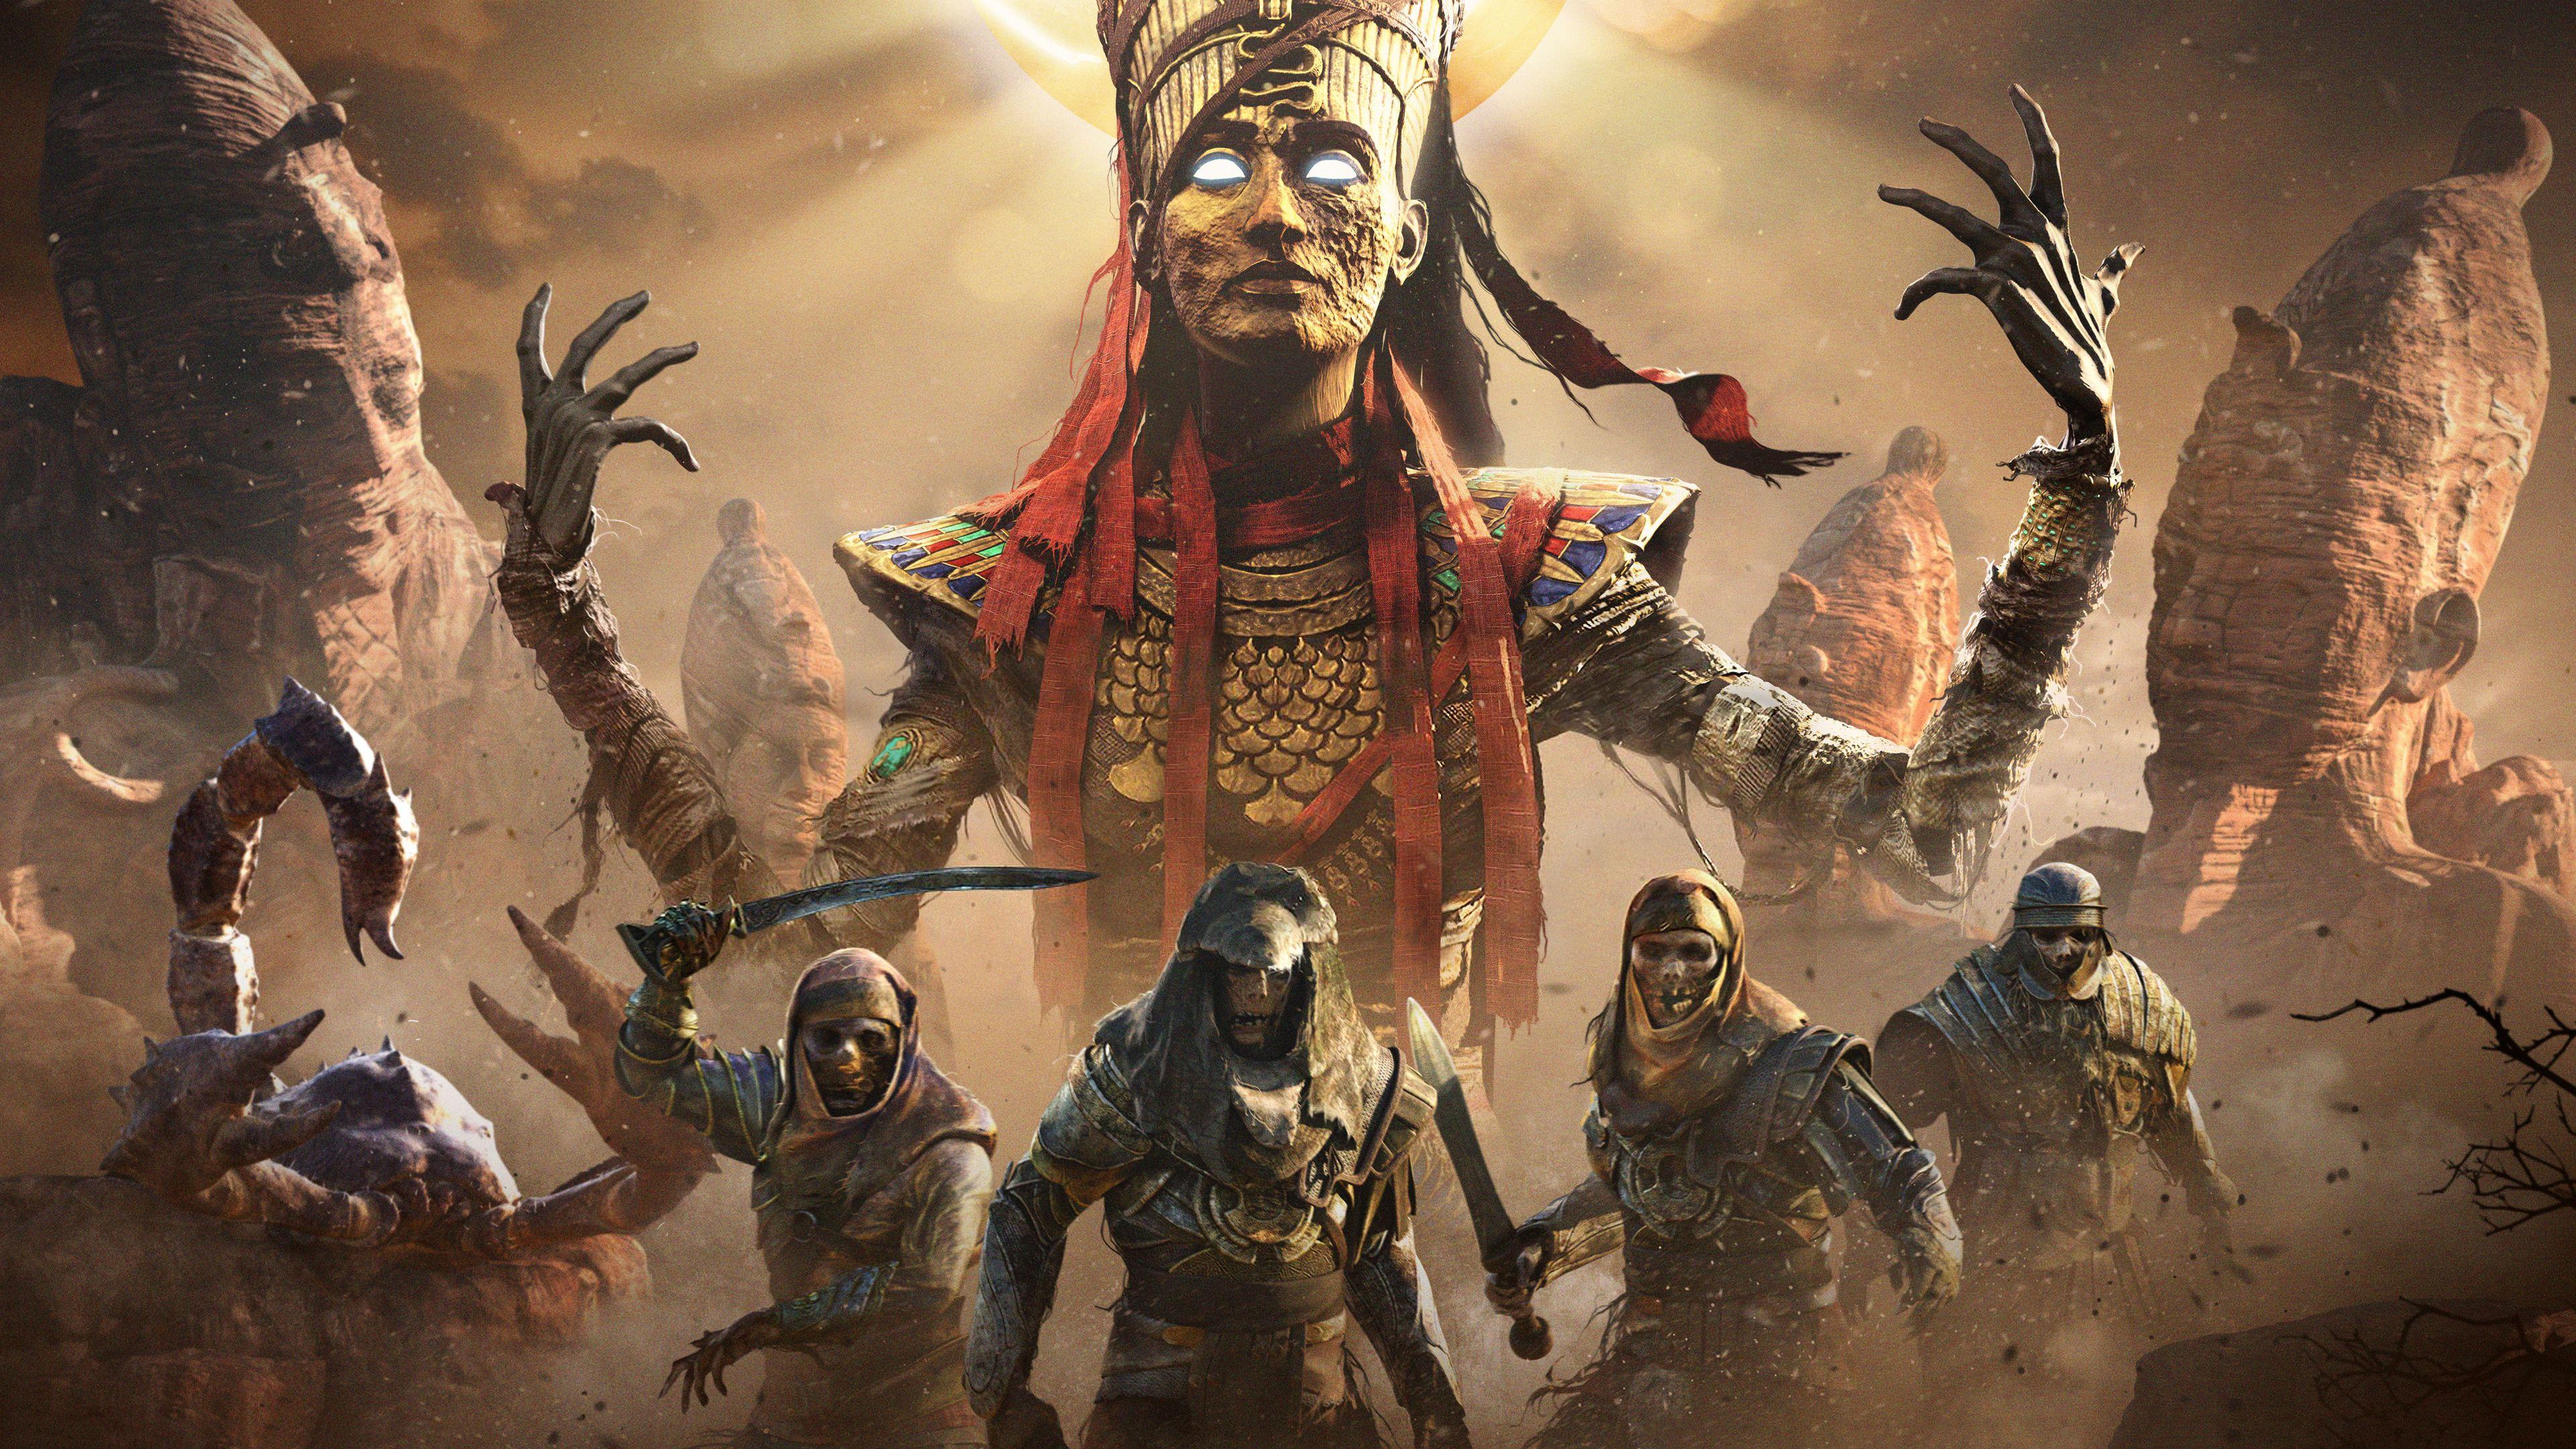 4k Assassins Creed Origins 2018 Xbox Games Wallpapers Ps Games Wallpapers Pc Games Wallpap Assassin S Creed Wallpaper Assassins Creed Origins Assassins Creed